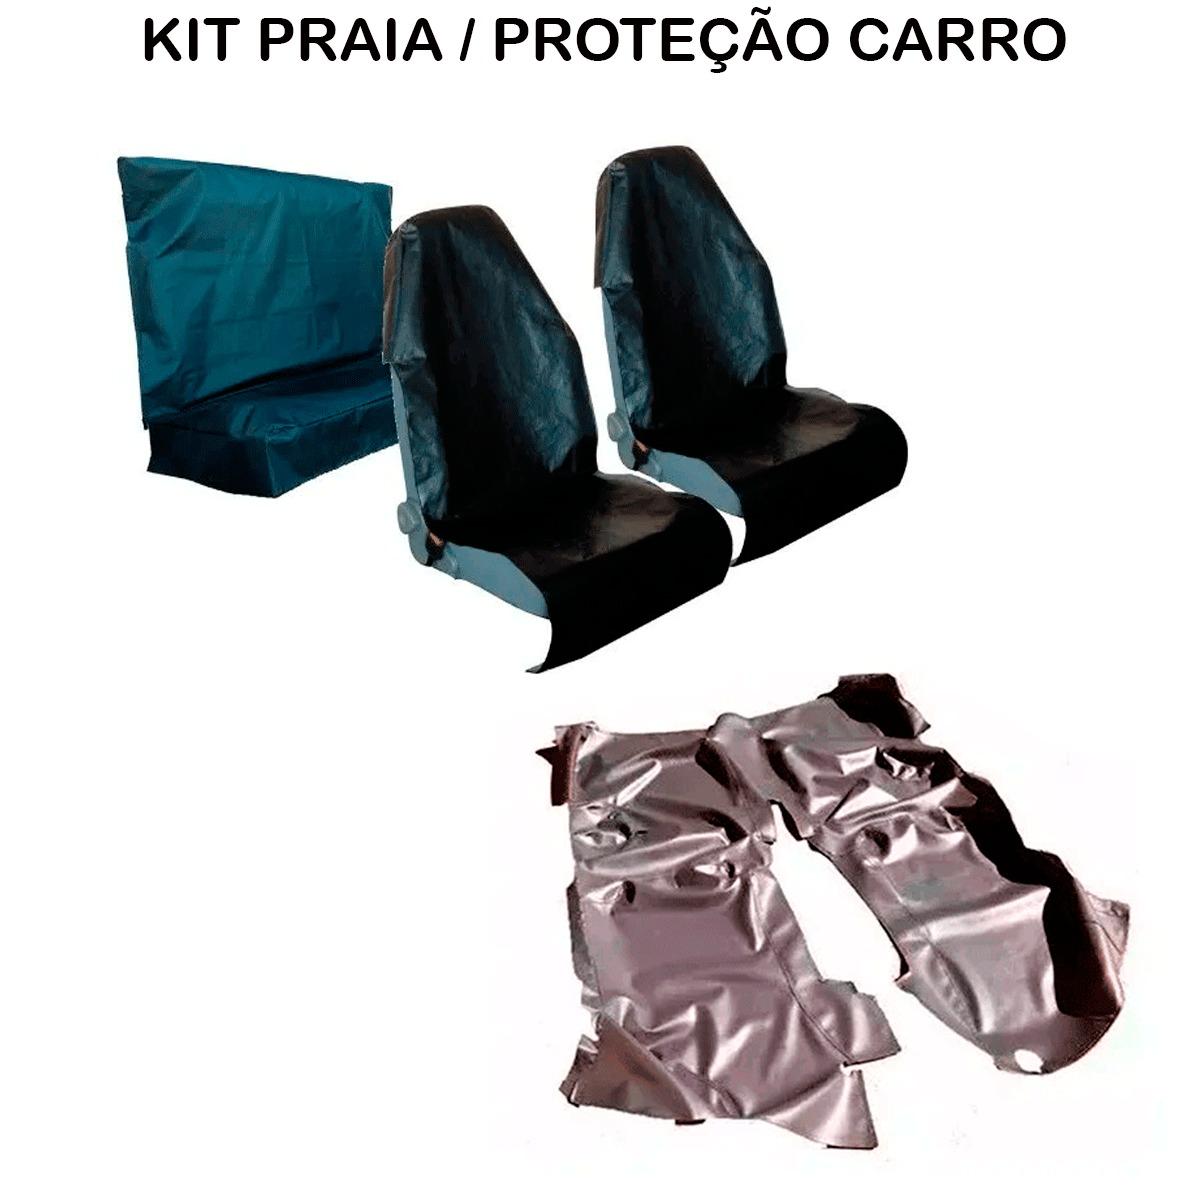 Tapete Em Vinil Ford Focus 2009 a 2013 + Capa Banco Protecao Banco Areia Suor Academia